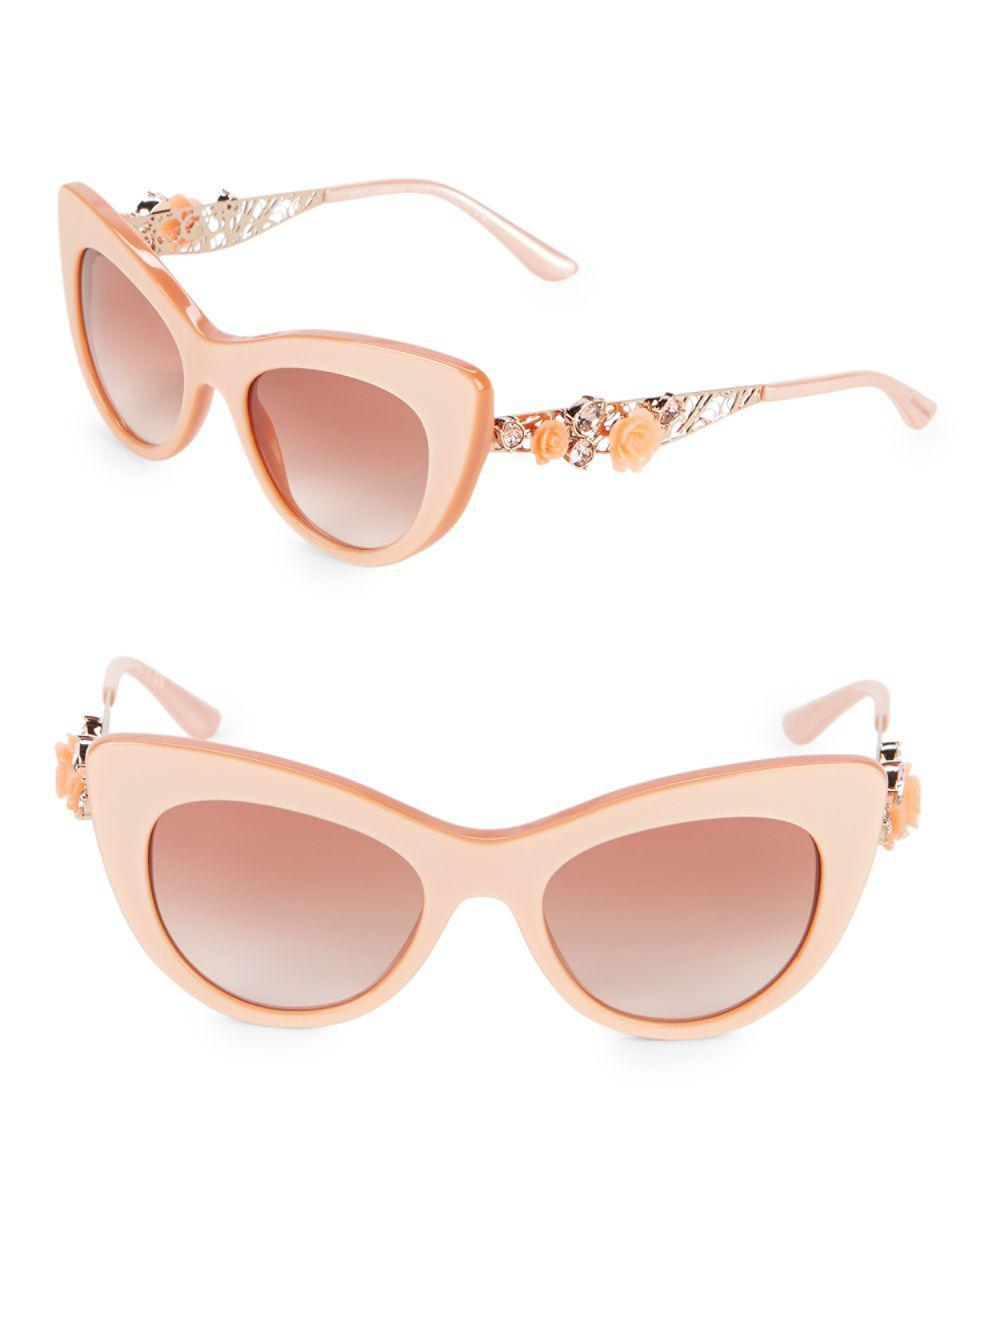 35e2cbf95198 Dolce   Gabbana 52mm Embellished Cat Eye Sunglasses in Pink - Lyst